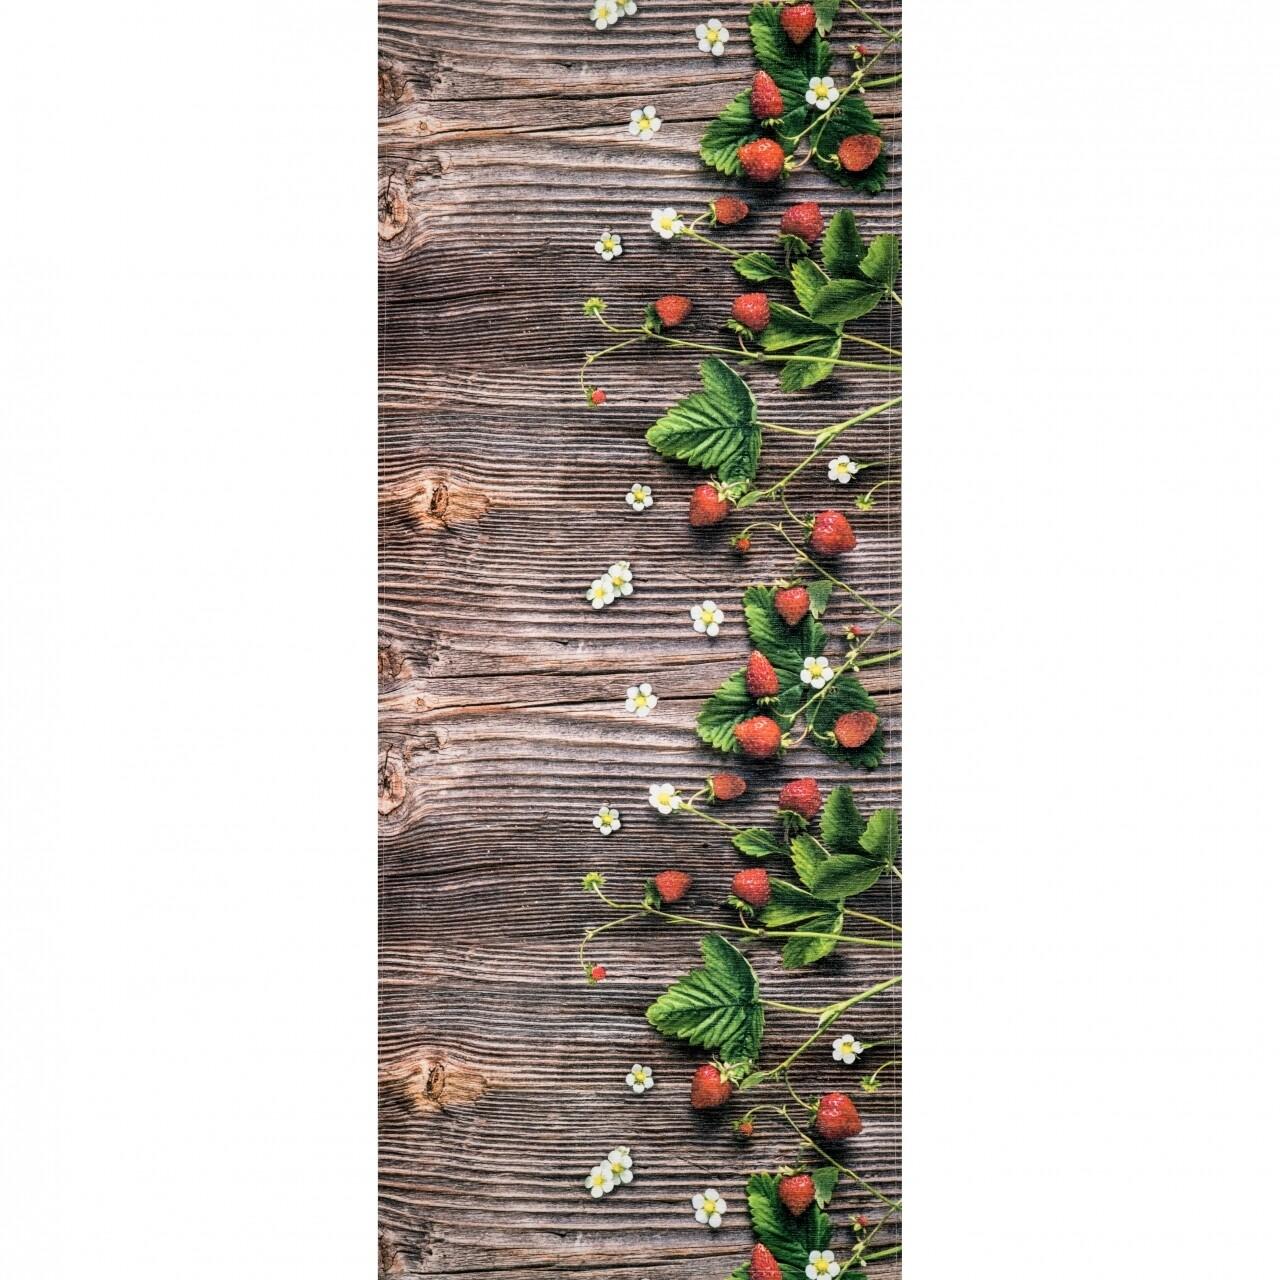 Covor rezistent Webtappeti FRAGOLINE CM 58x80 cm, multicolor